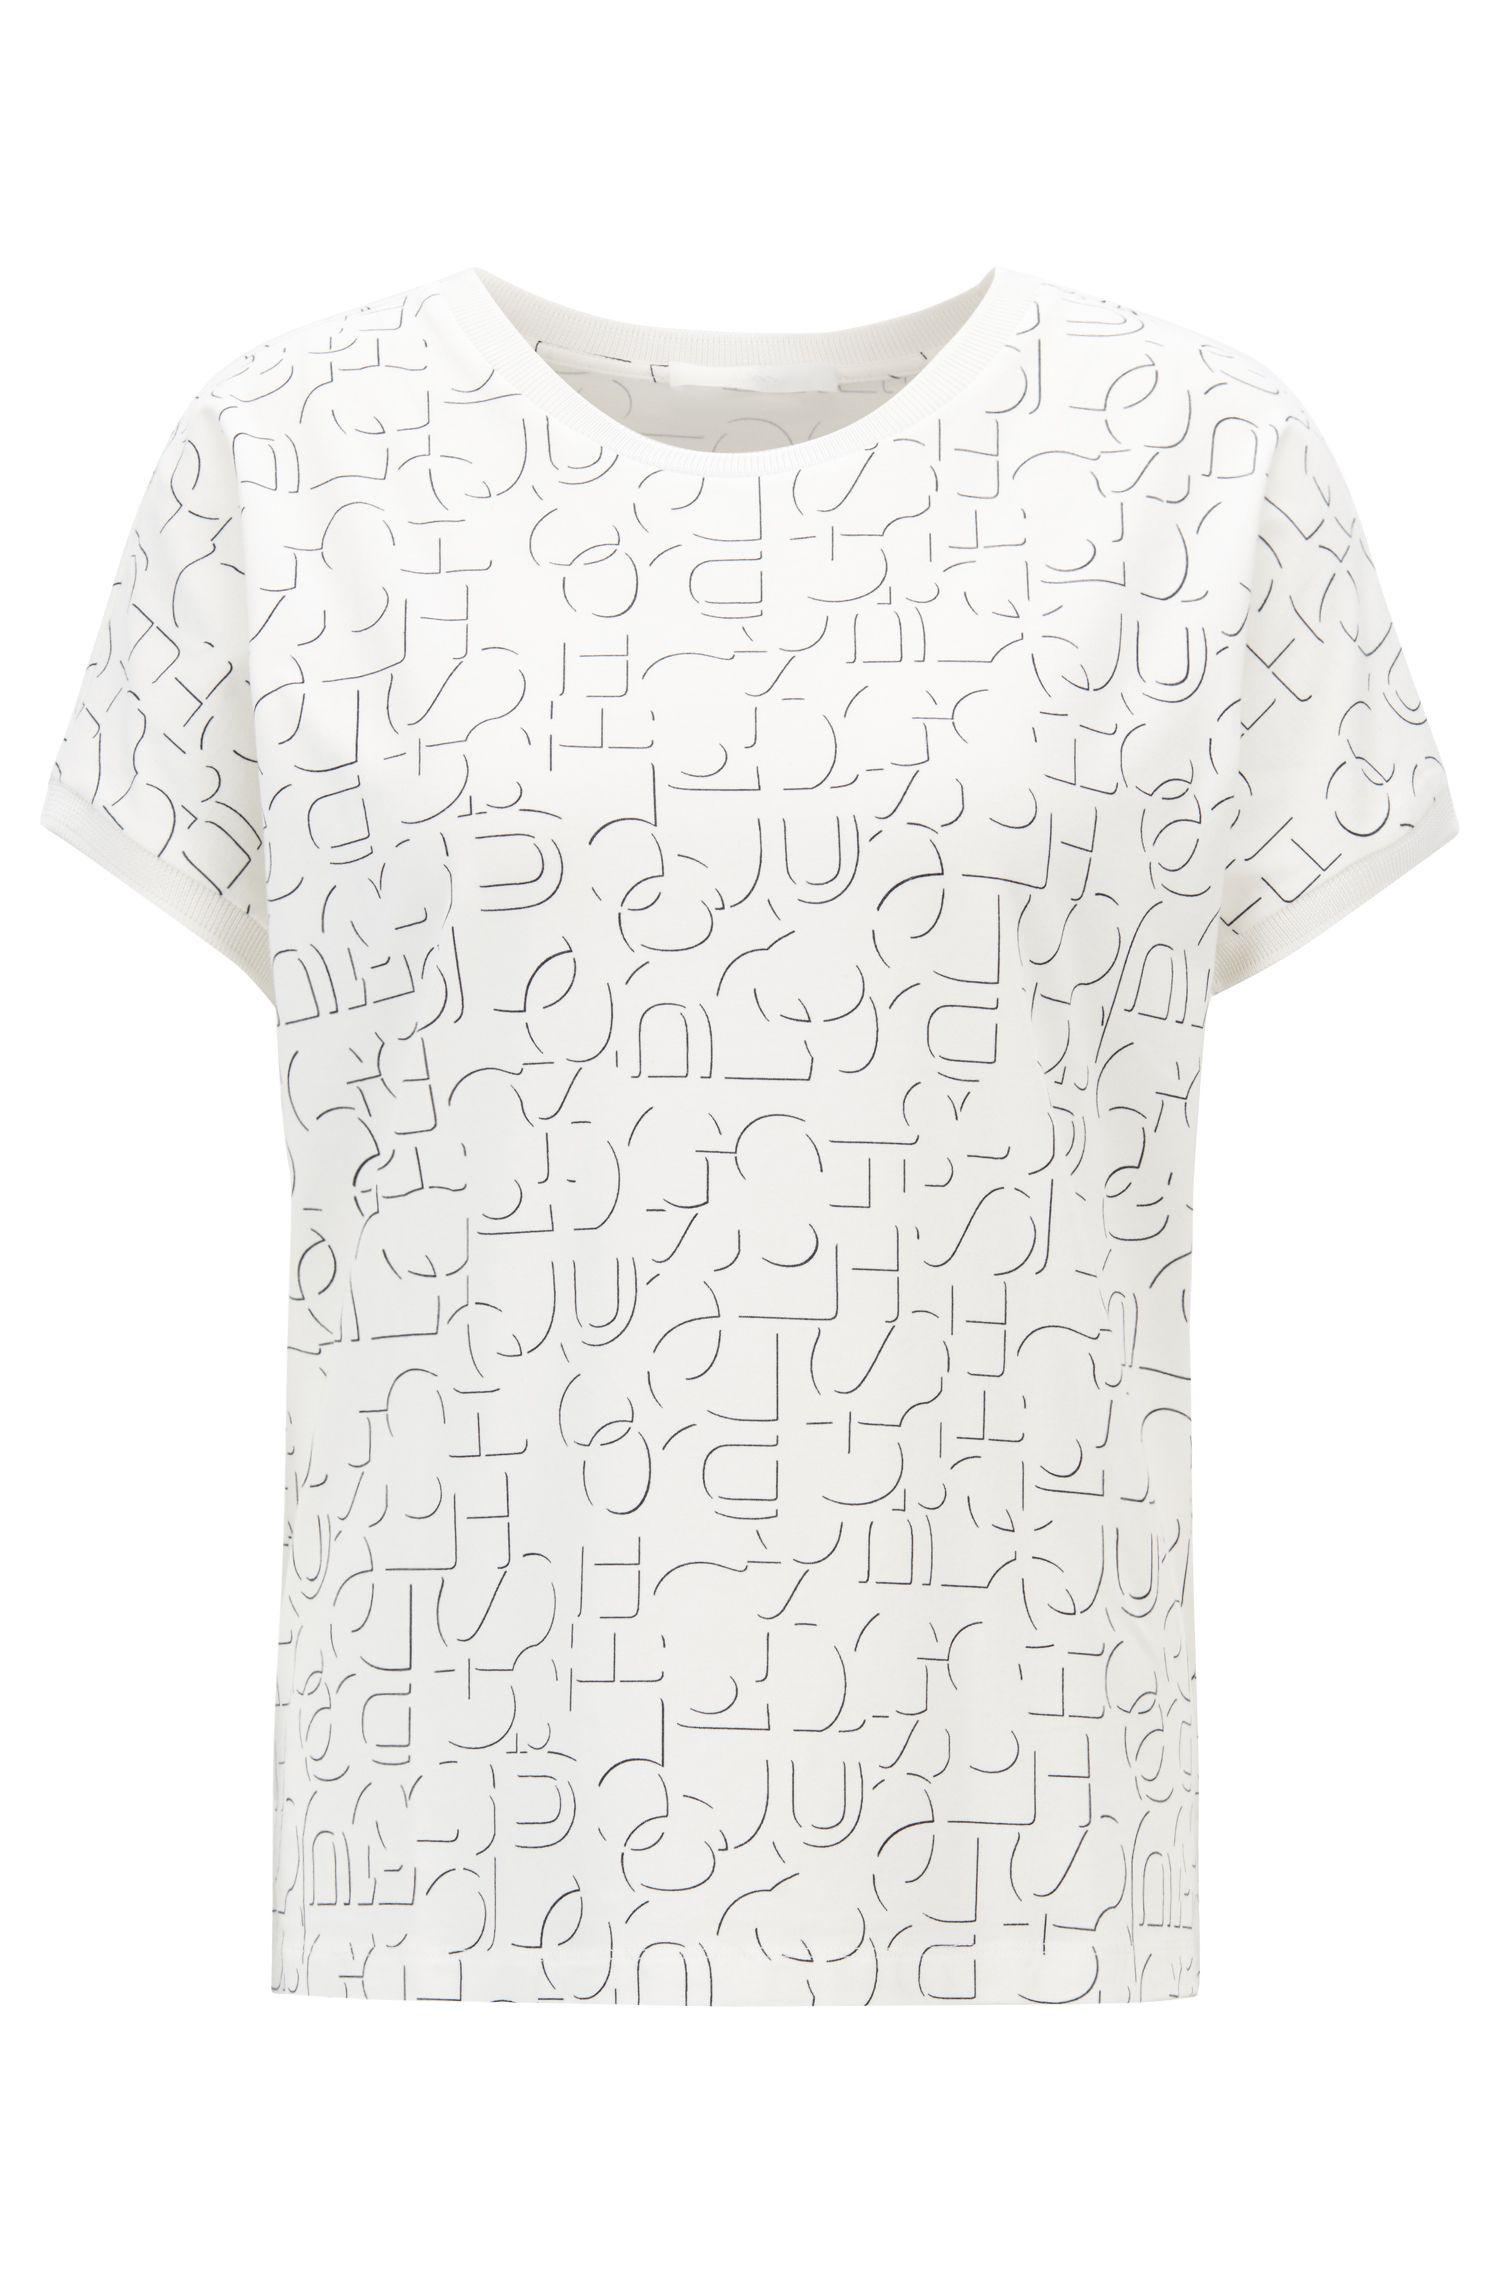 Kurzarm-Top aus Stretch-Jersey mit abstraktem Logo-Dessin